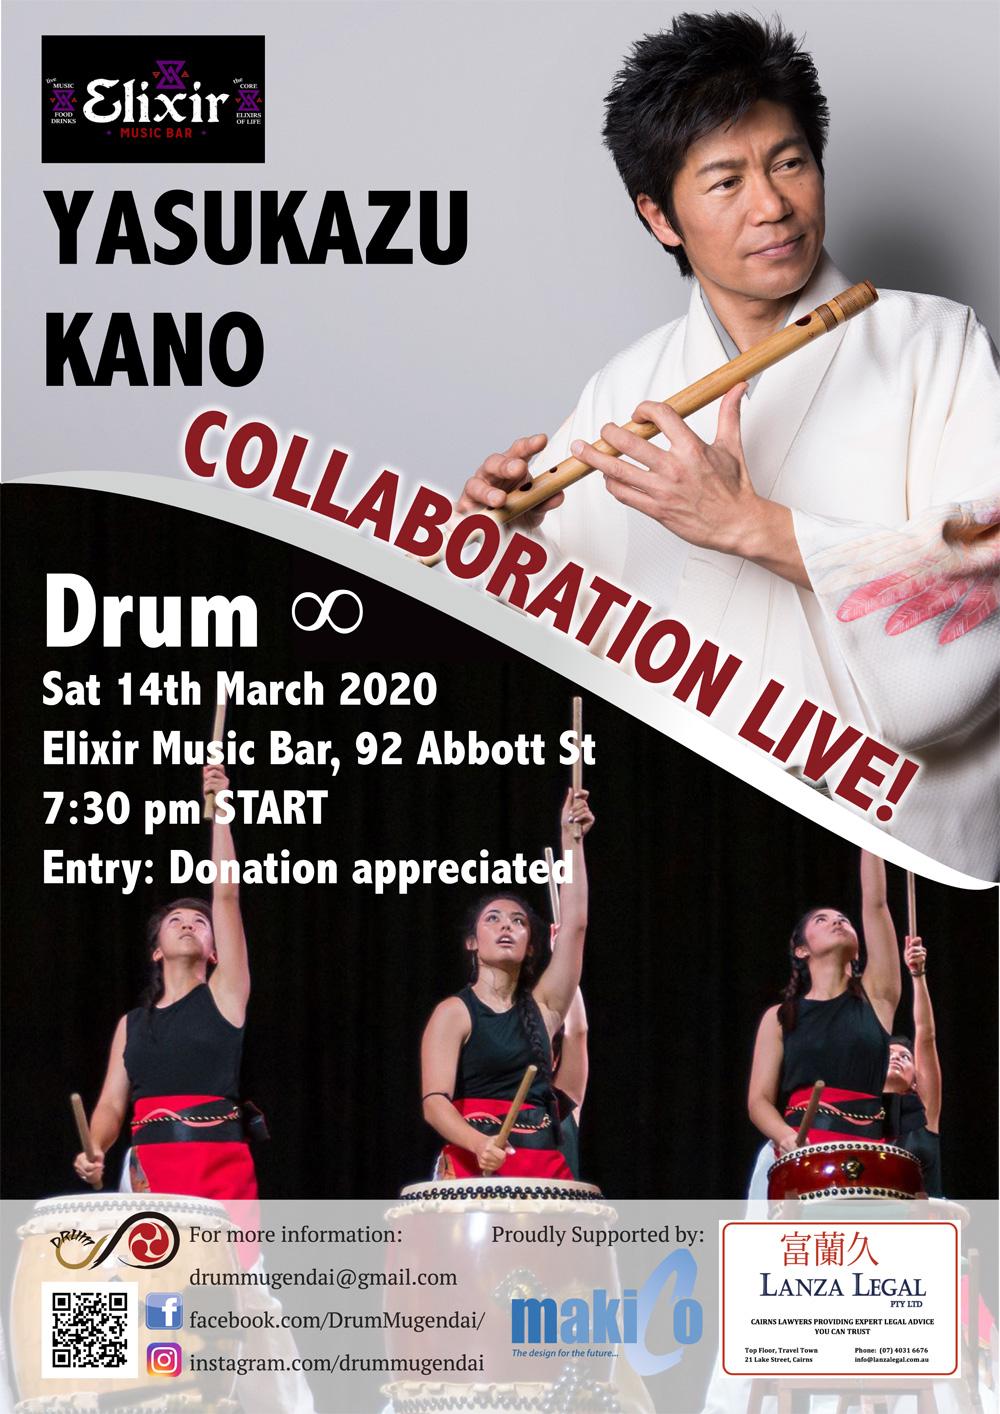 Yasukazu Kano & Drum ∞ Collaboration Live performance!